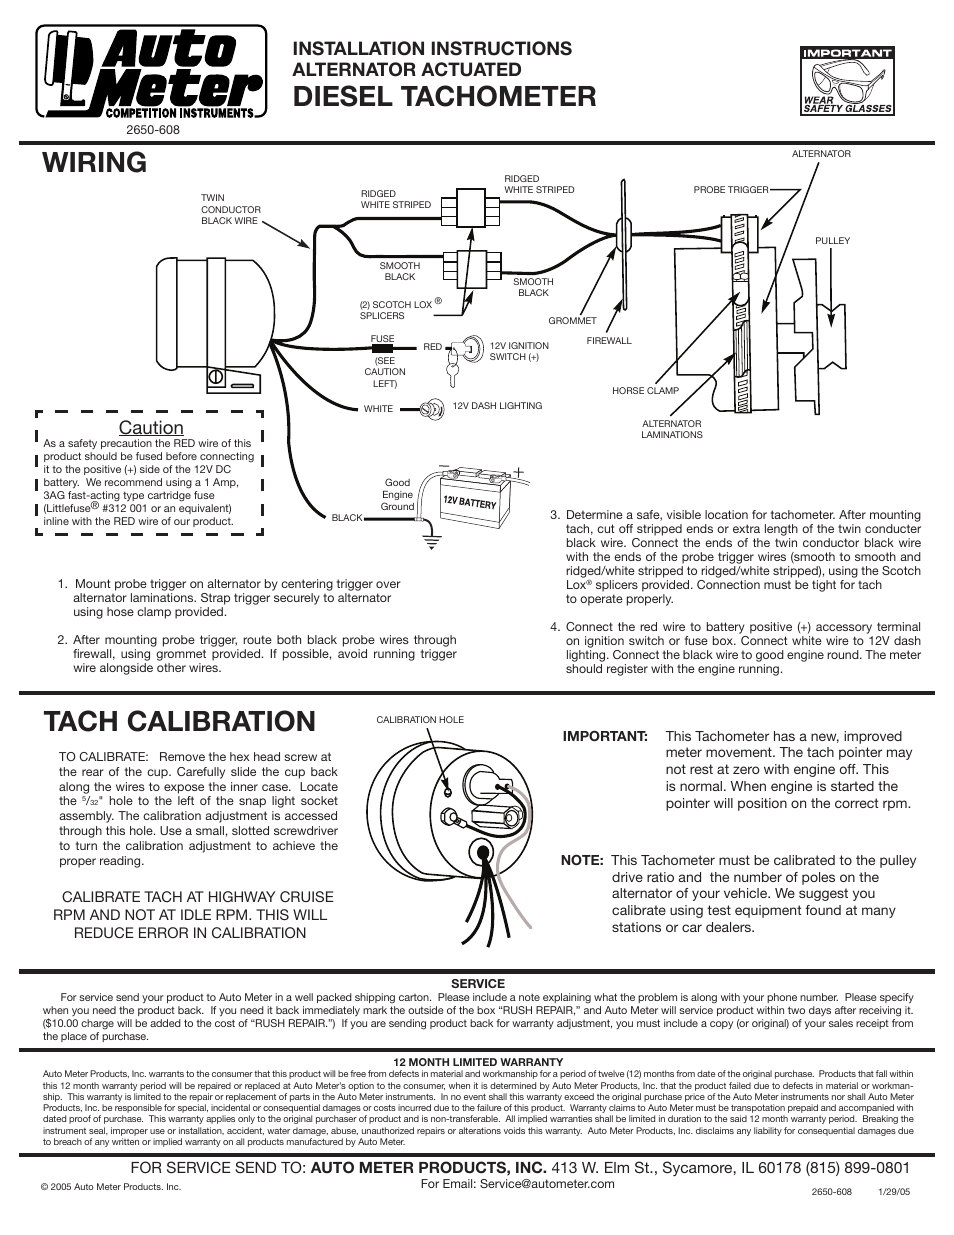 Autometer Tach Wiring | Wiring Diagram - Autometer Tach Wiring Diagram